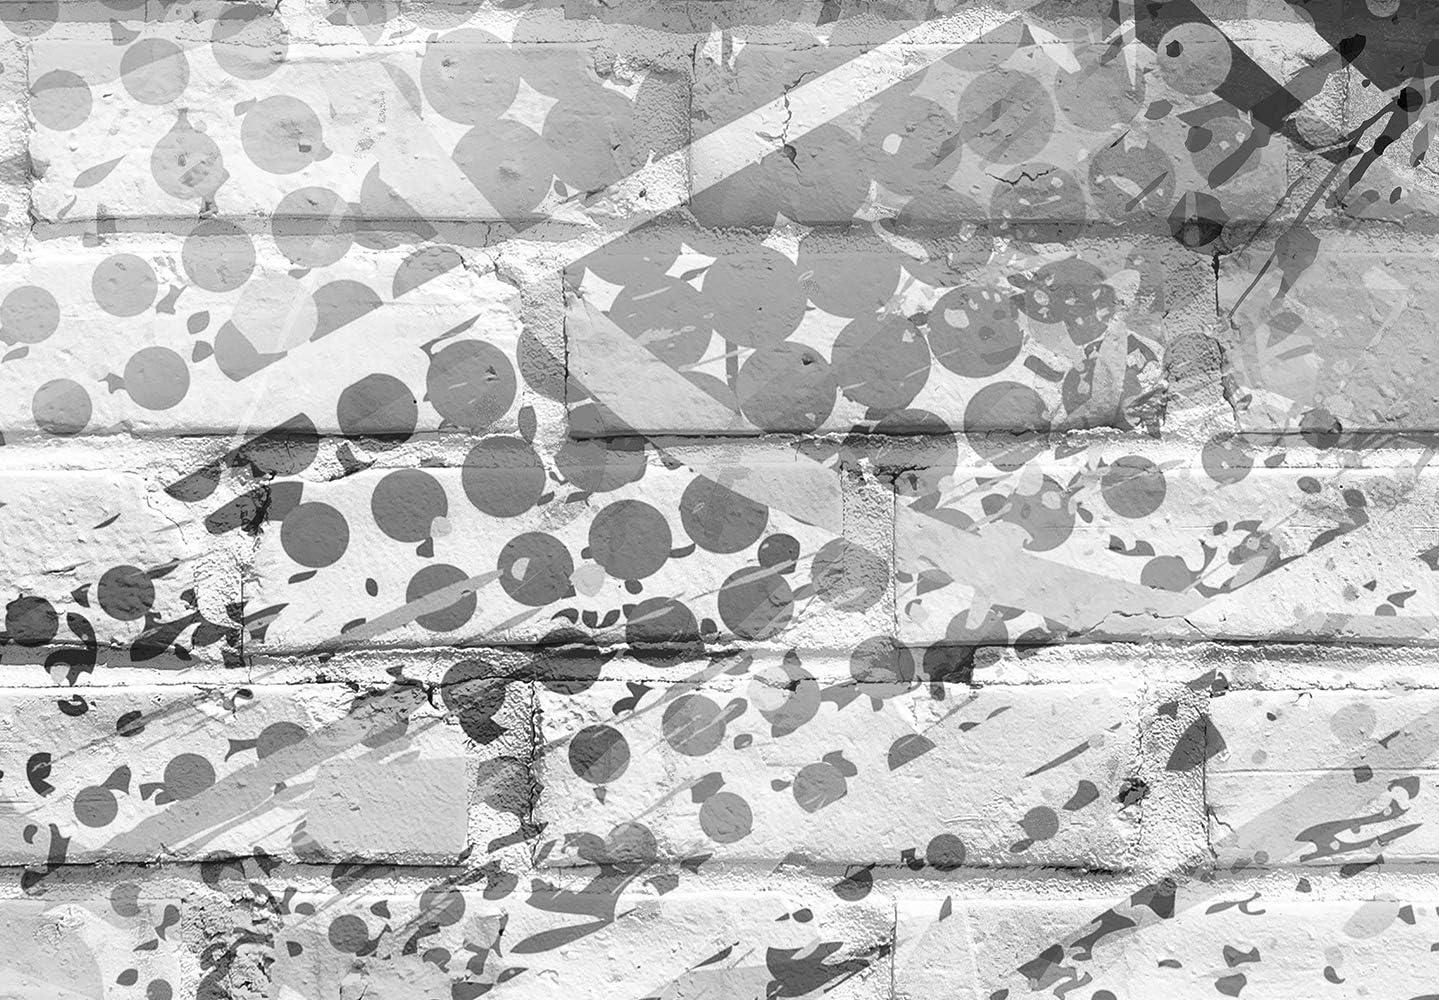 Fu/ßball Ziegel Graffiti Kindertapete Kinderzimmer Kinder i-B-0044-a-a murando Fototapete selbstklebend Fussball 294x210 cm decor Tapeten Wandtapete klebend Klebefolie Dekofolie Tapetenfolie